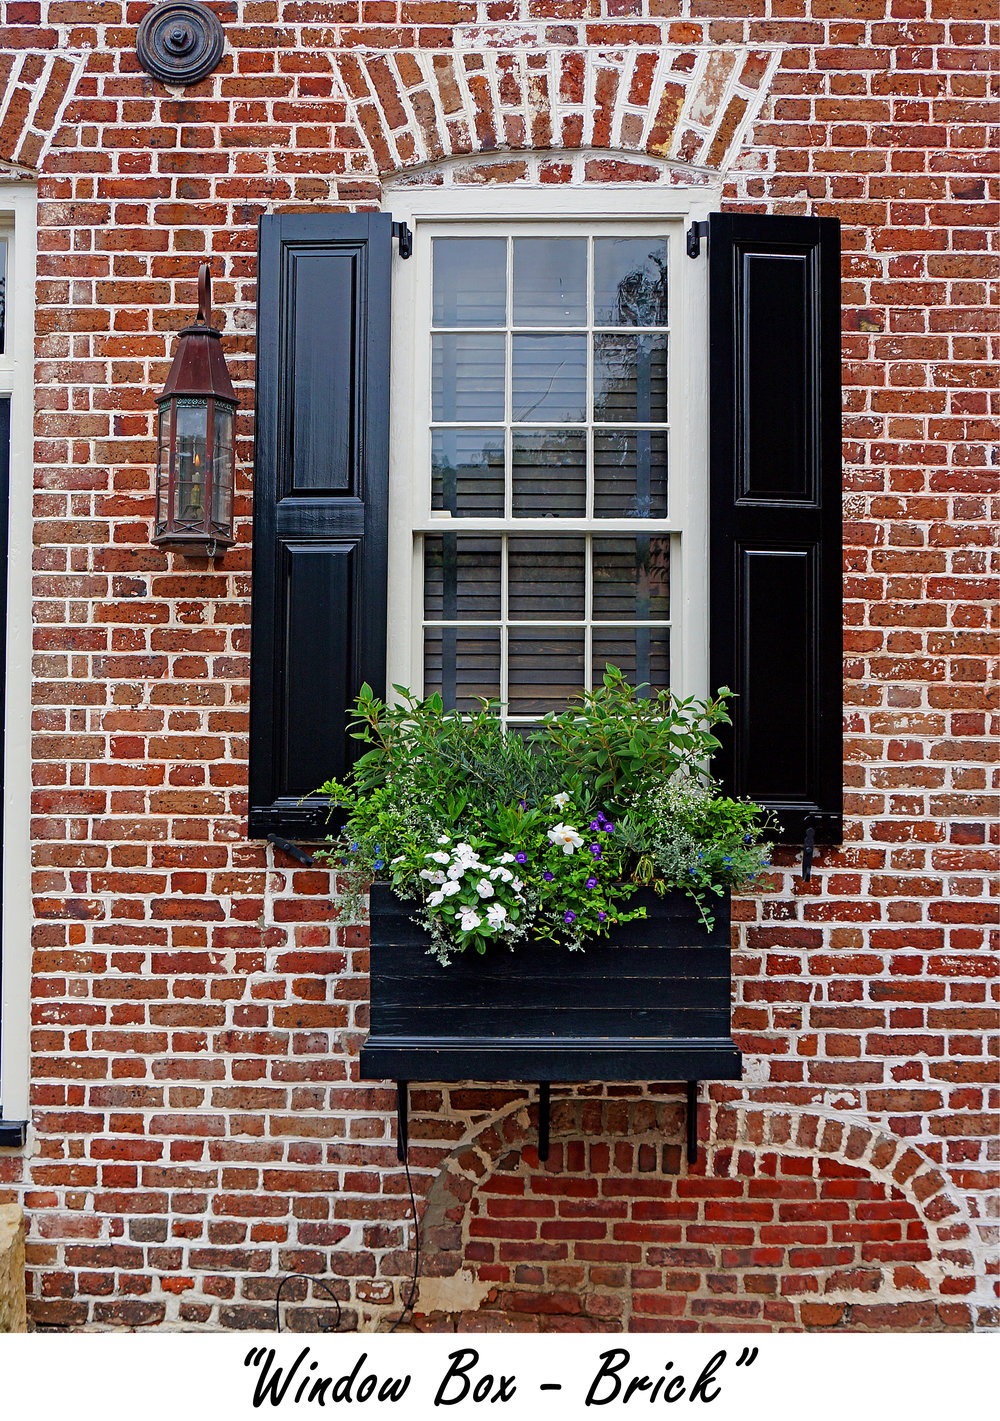 windowbox Brick.jpg